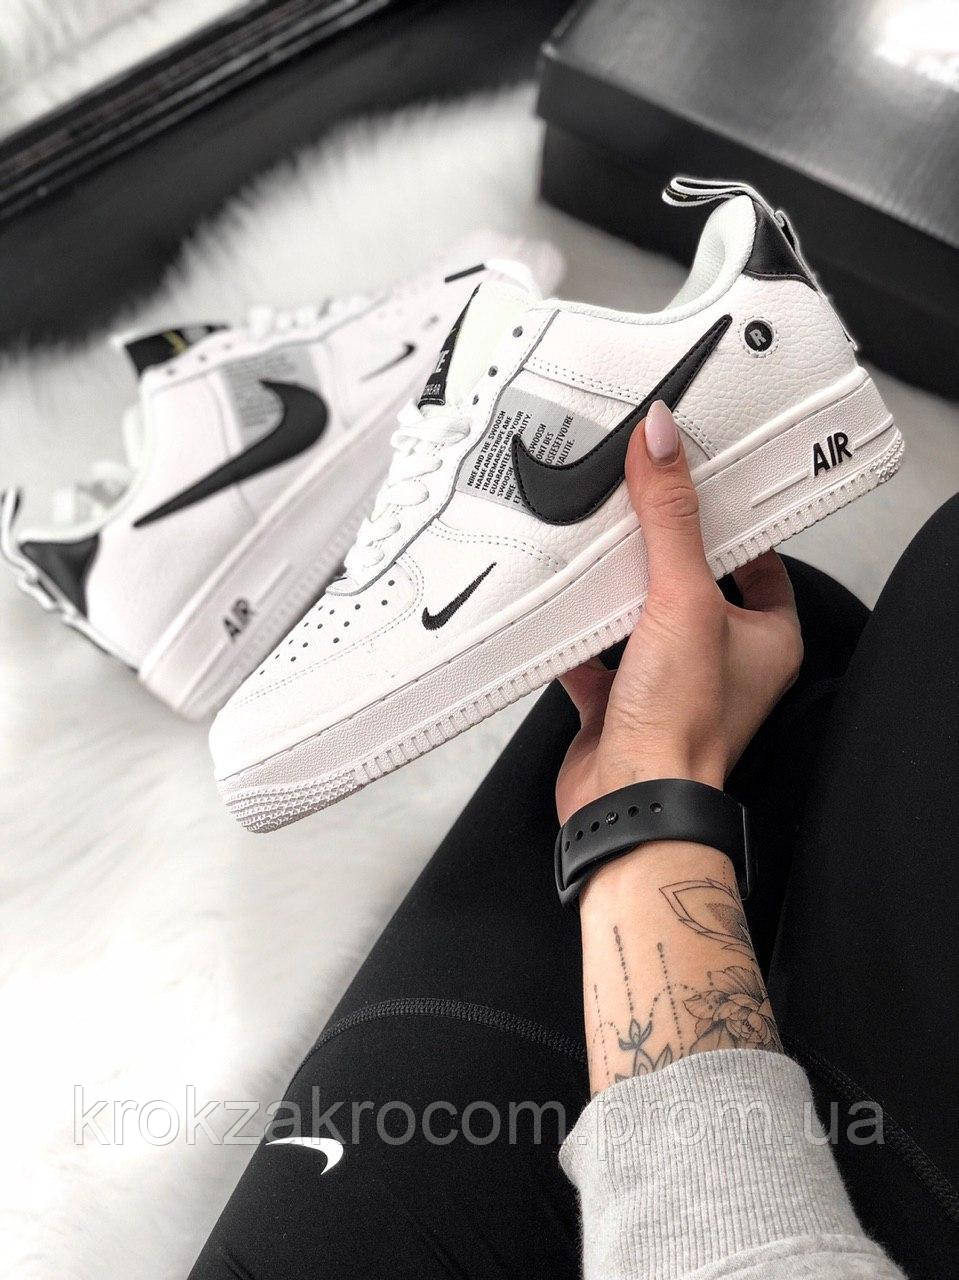 8d8fb318 Кроссовки Nike Air Force 1 Low White replica AAA 38-24,5 см: продажа ...